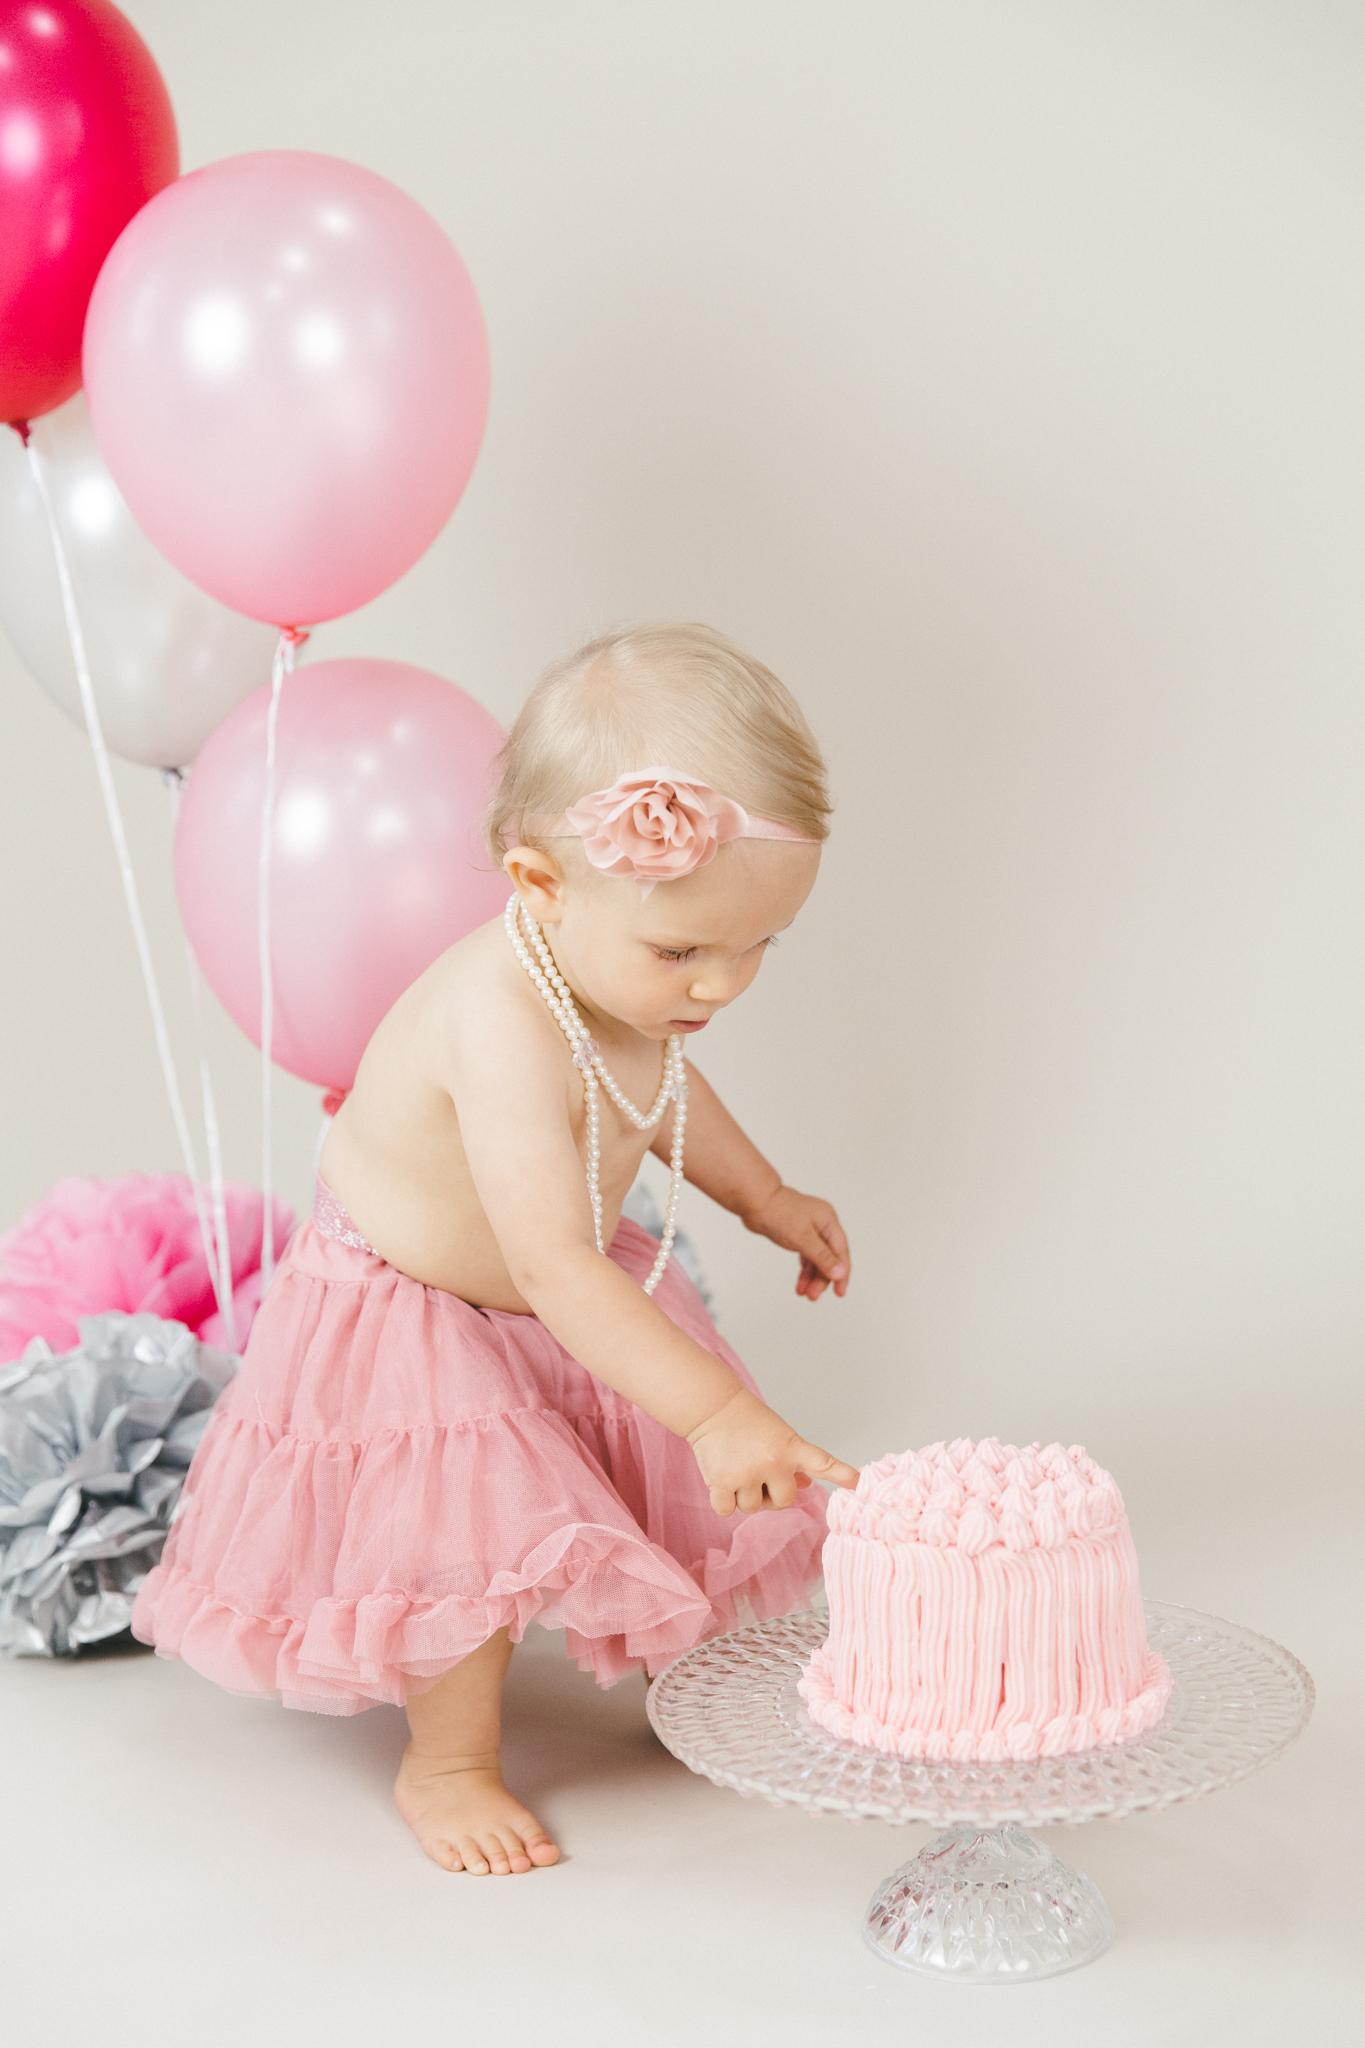 Smash the cake ViOli Photography fotograf Kalshamn, Blekinge (5 av 10)